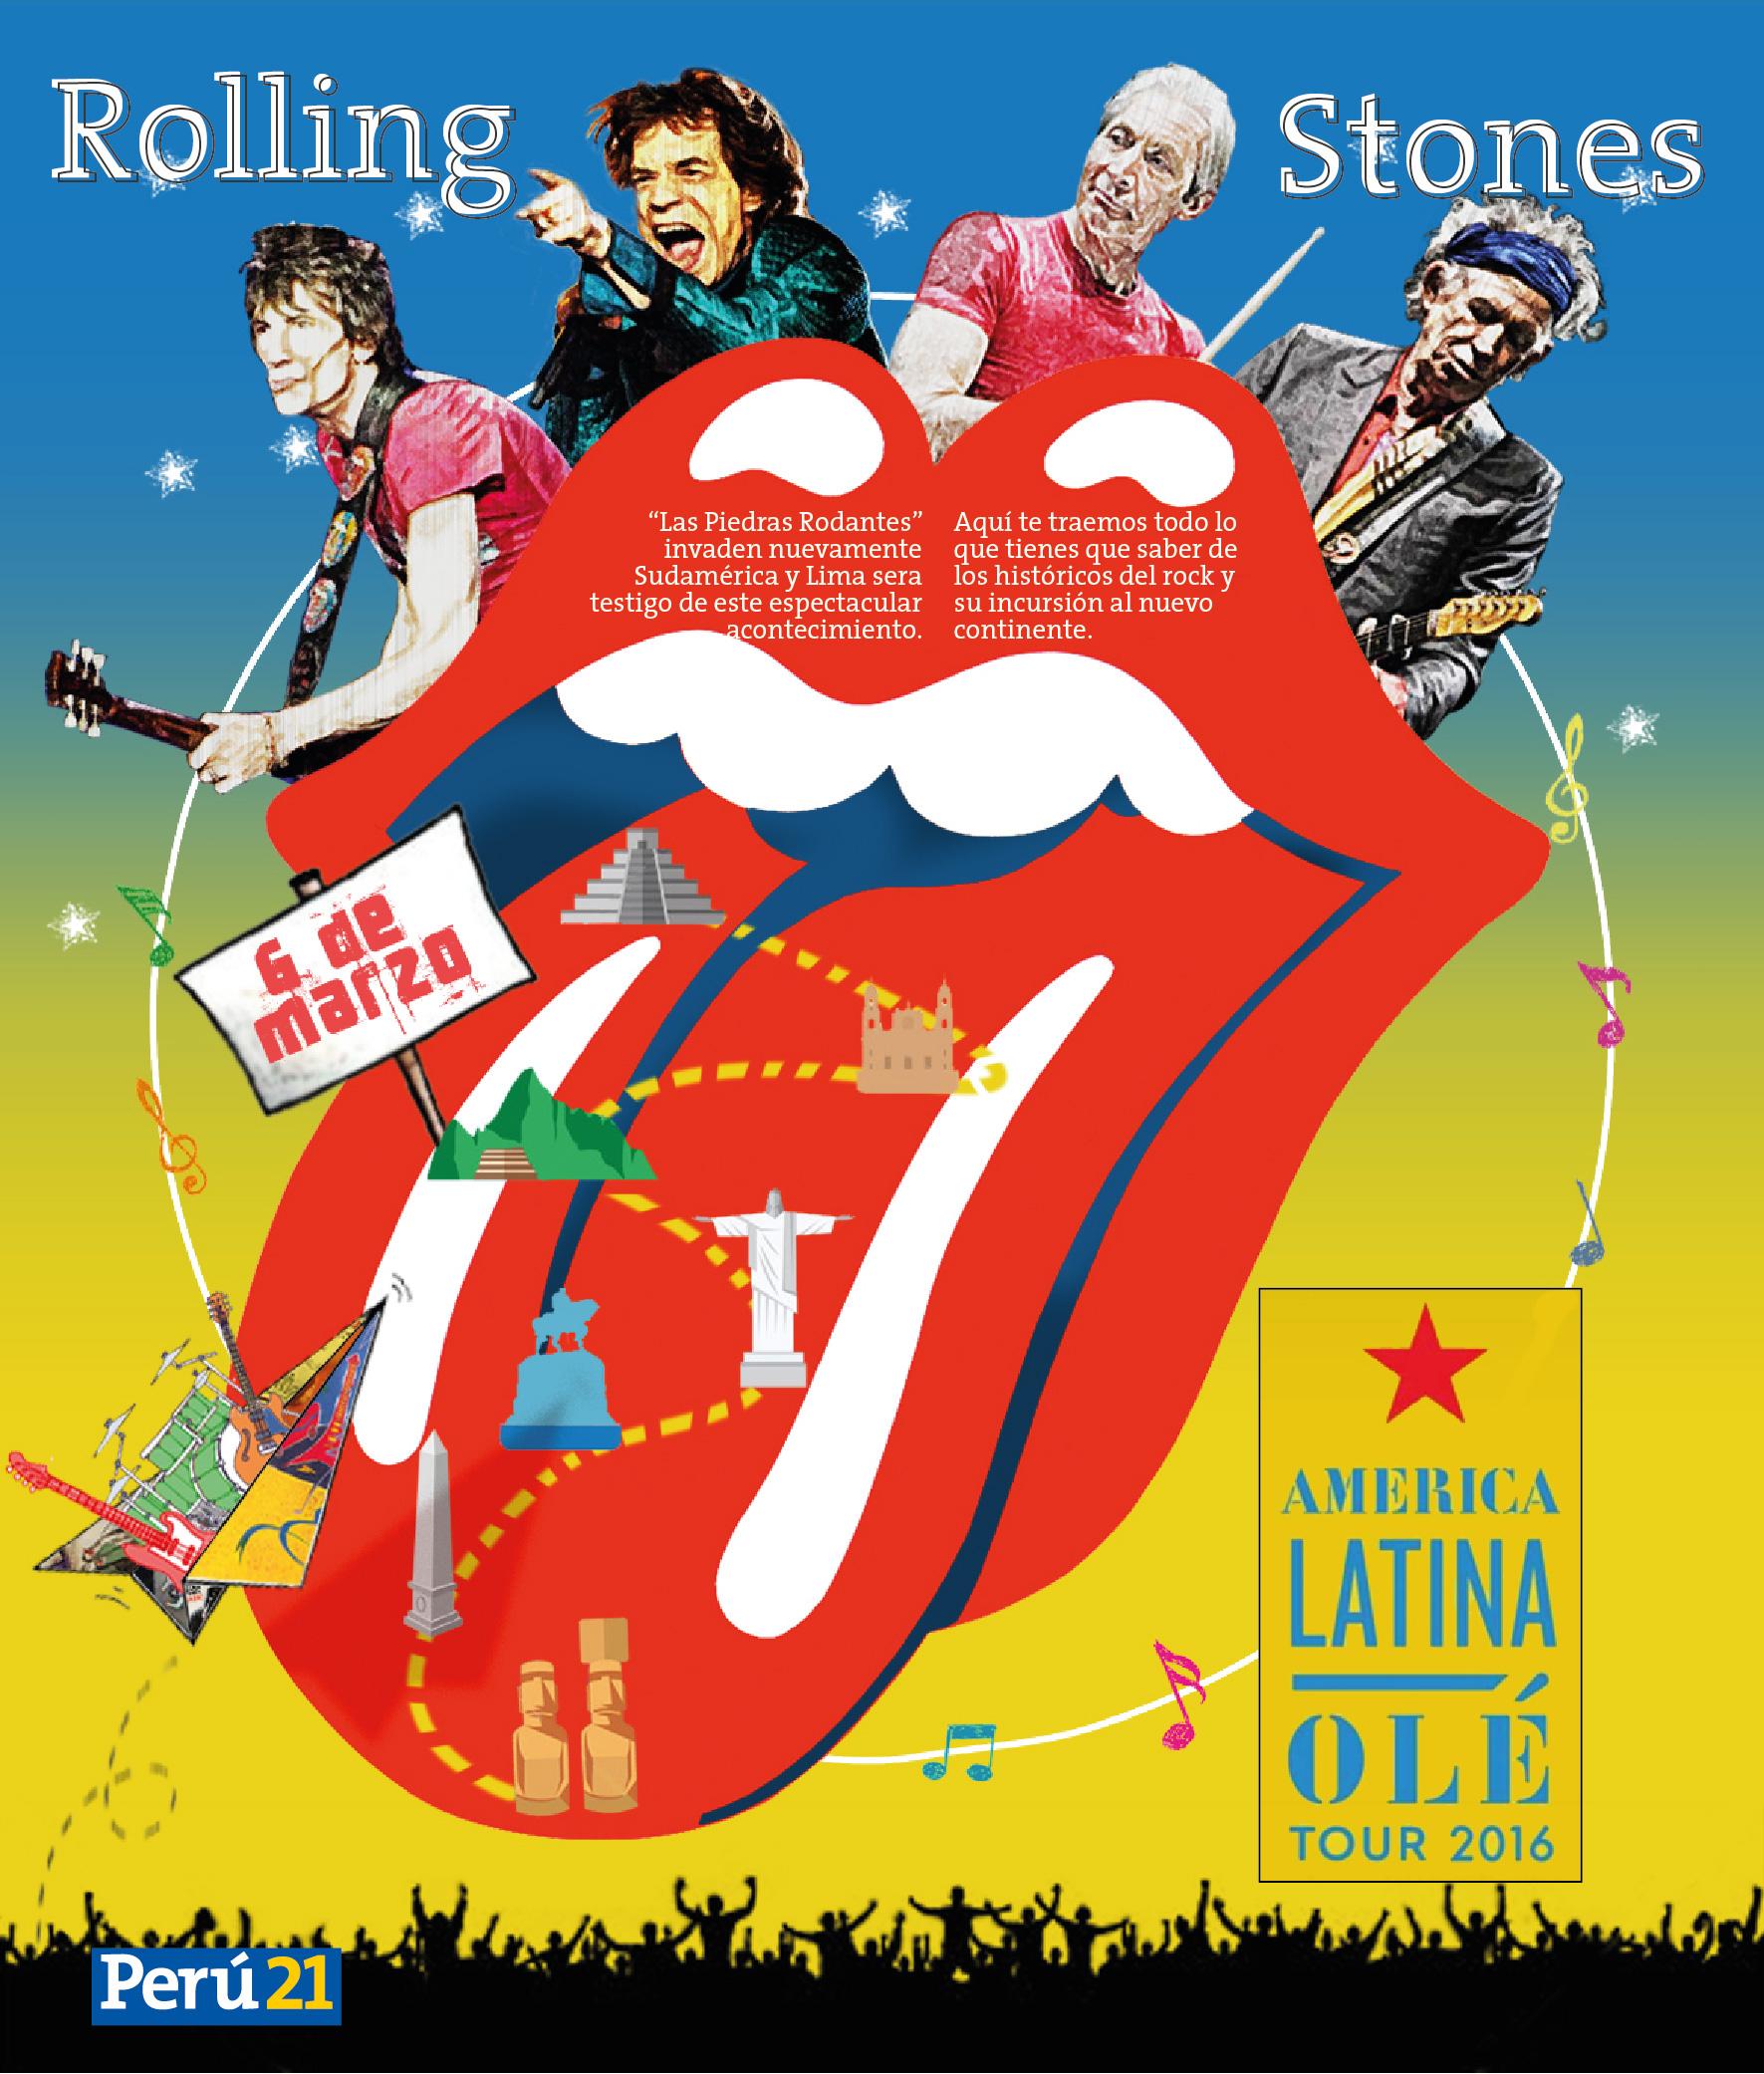 Rolling Stones: America Latina OLÉ Tour 2016